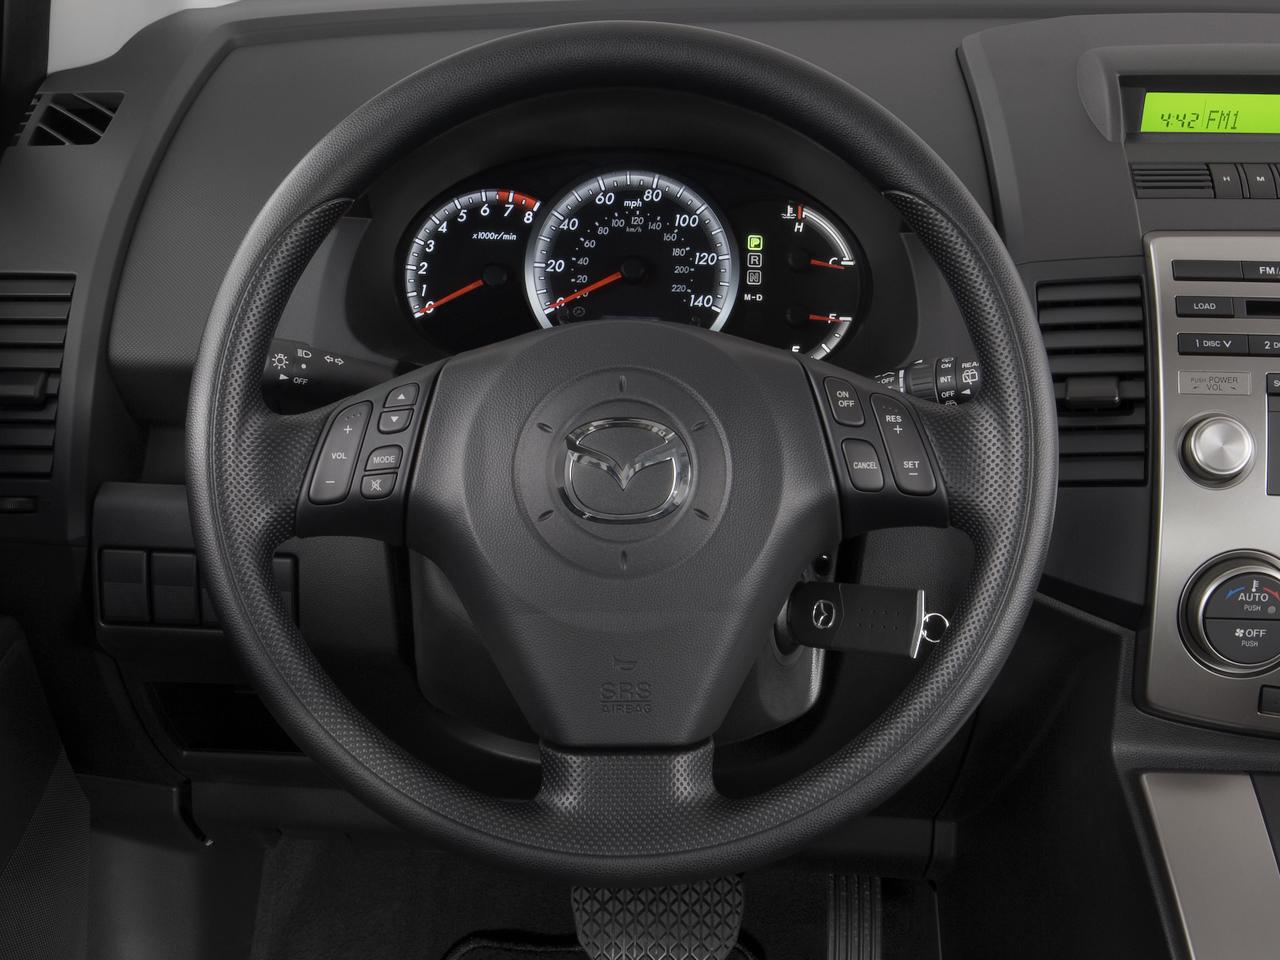 https://st.automobilemag.com/uploads/sites/10/2015/11/2008-mazda-mazda5-sport-wagon-steering-wheel.png